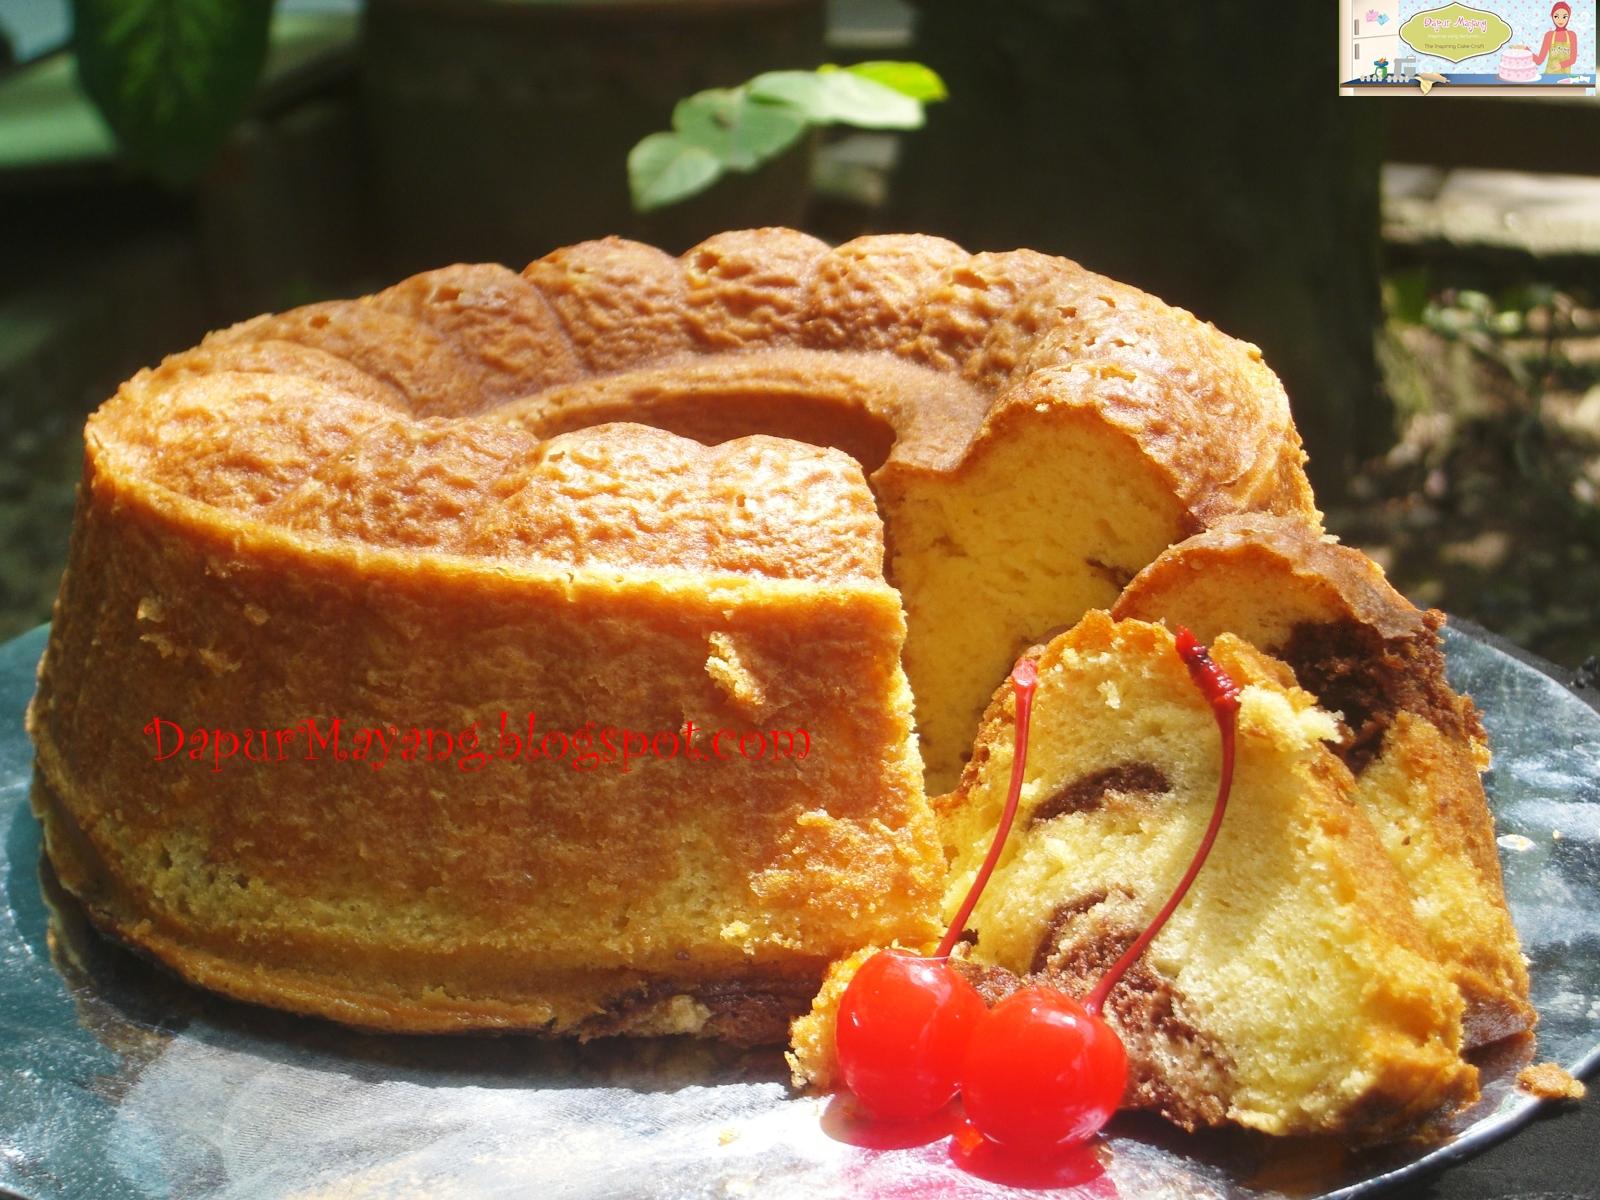 Resep Rainbow Cake Ncc Fatmah Bahalwan: RESEP RAINBOW CAKE SEHAT